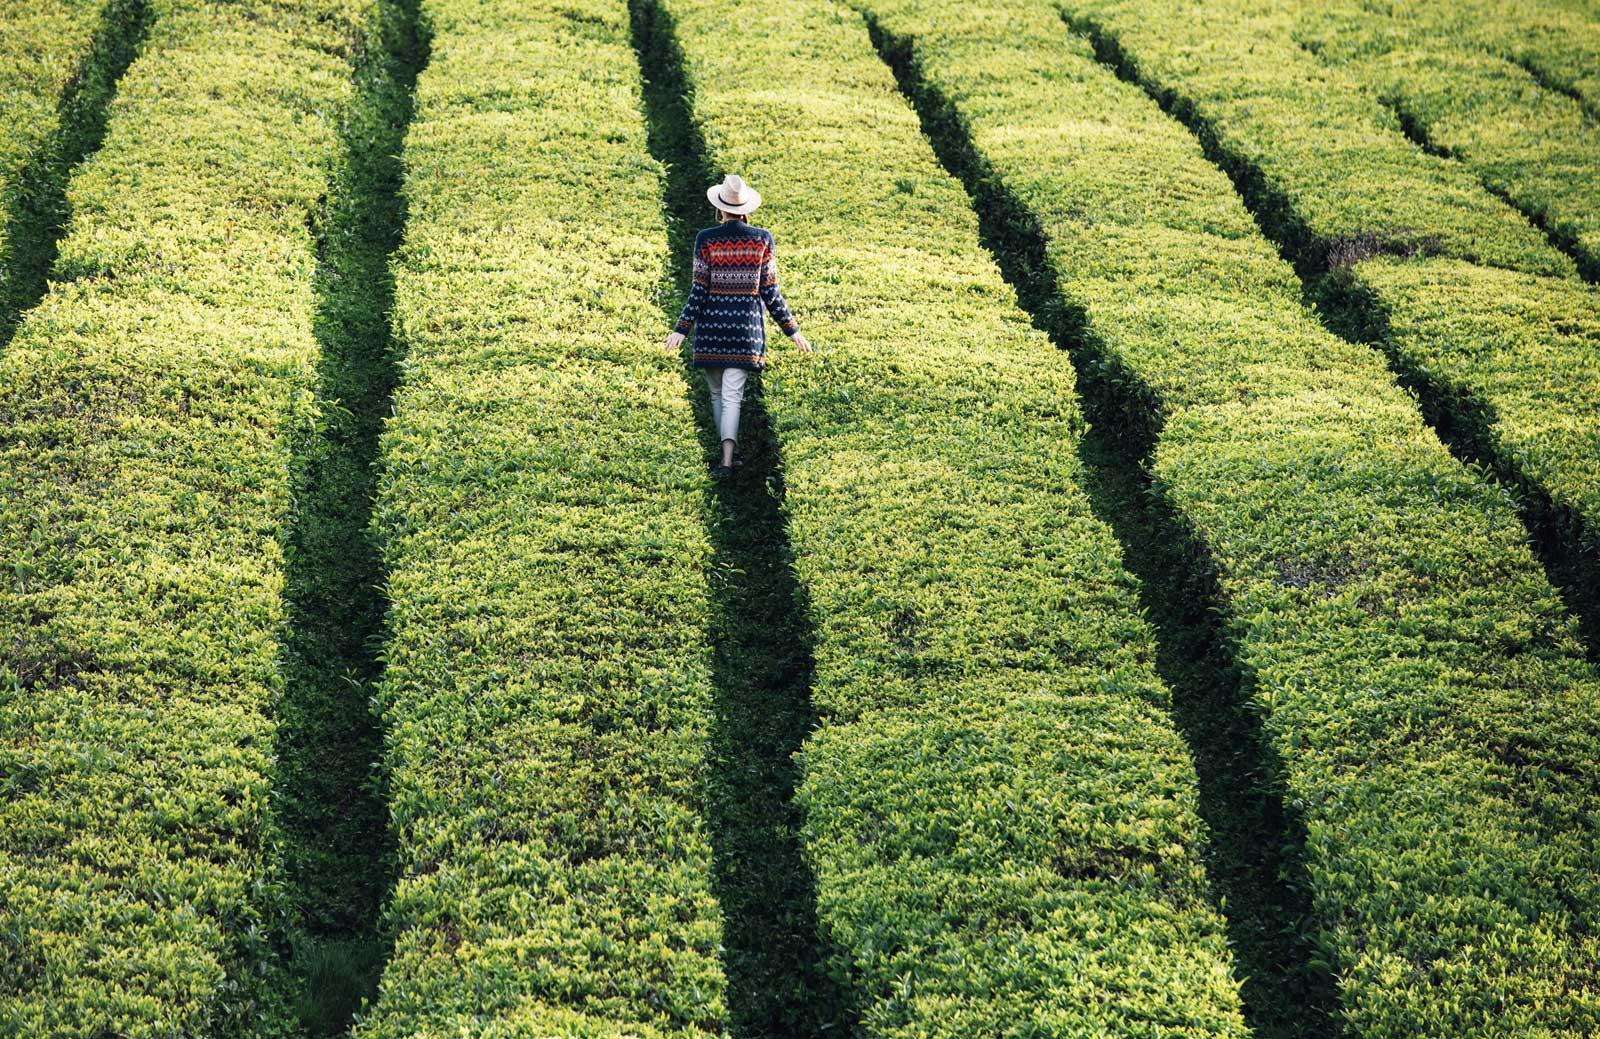 plantation de thé en europe